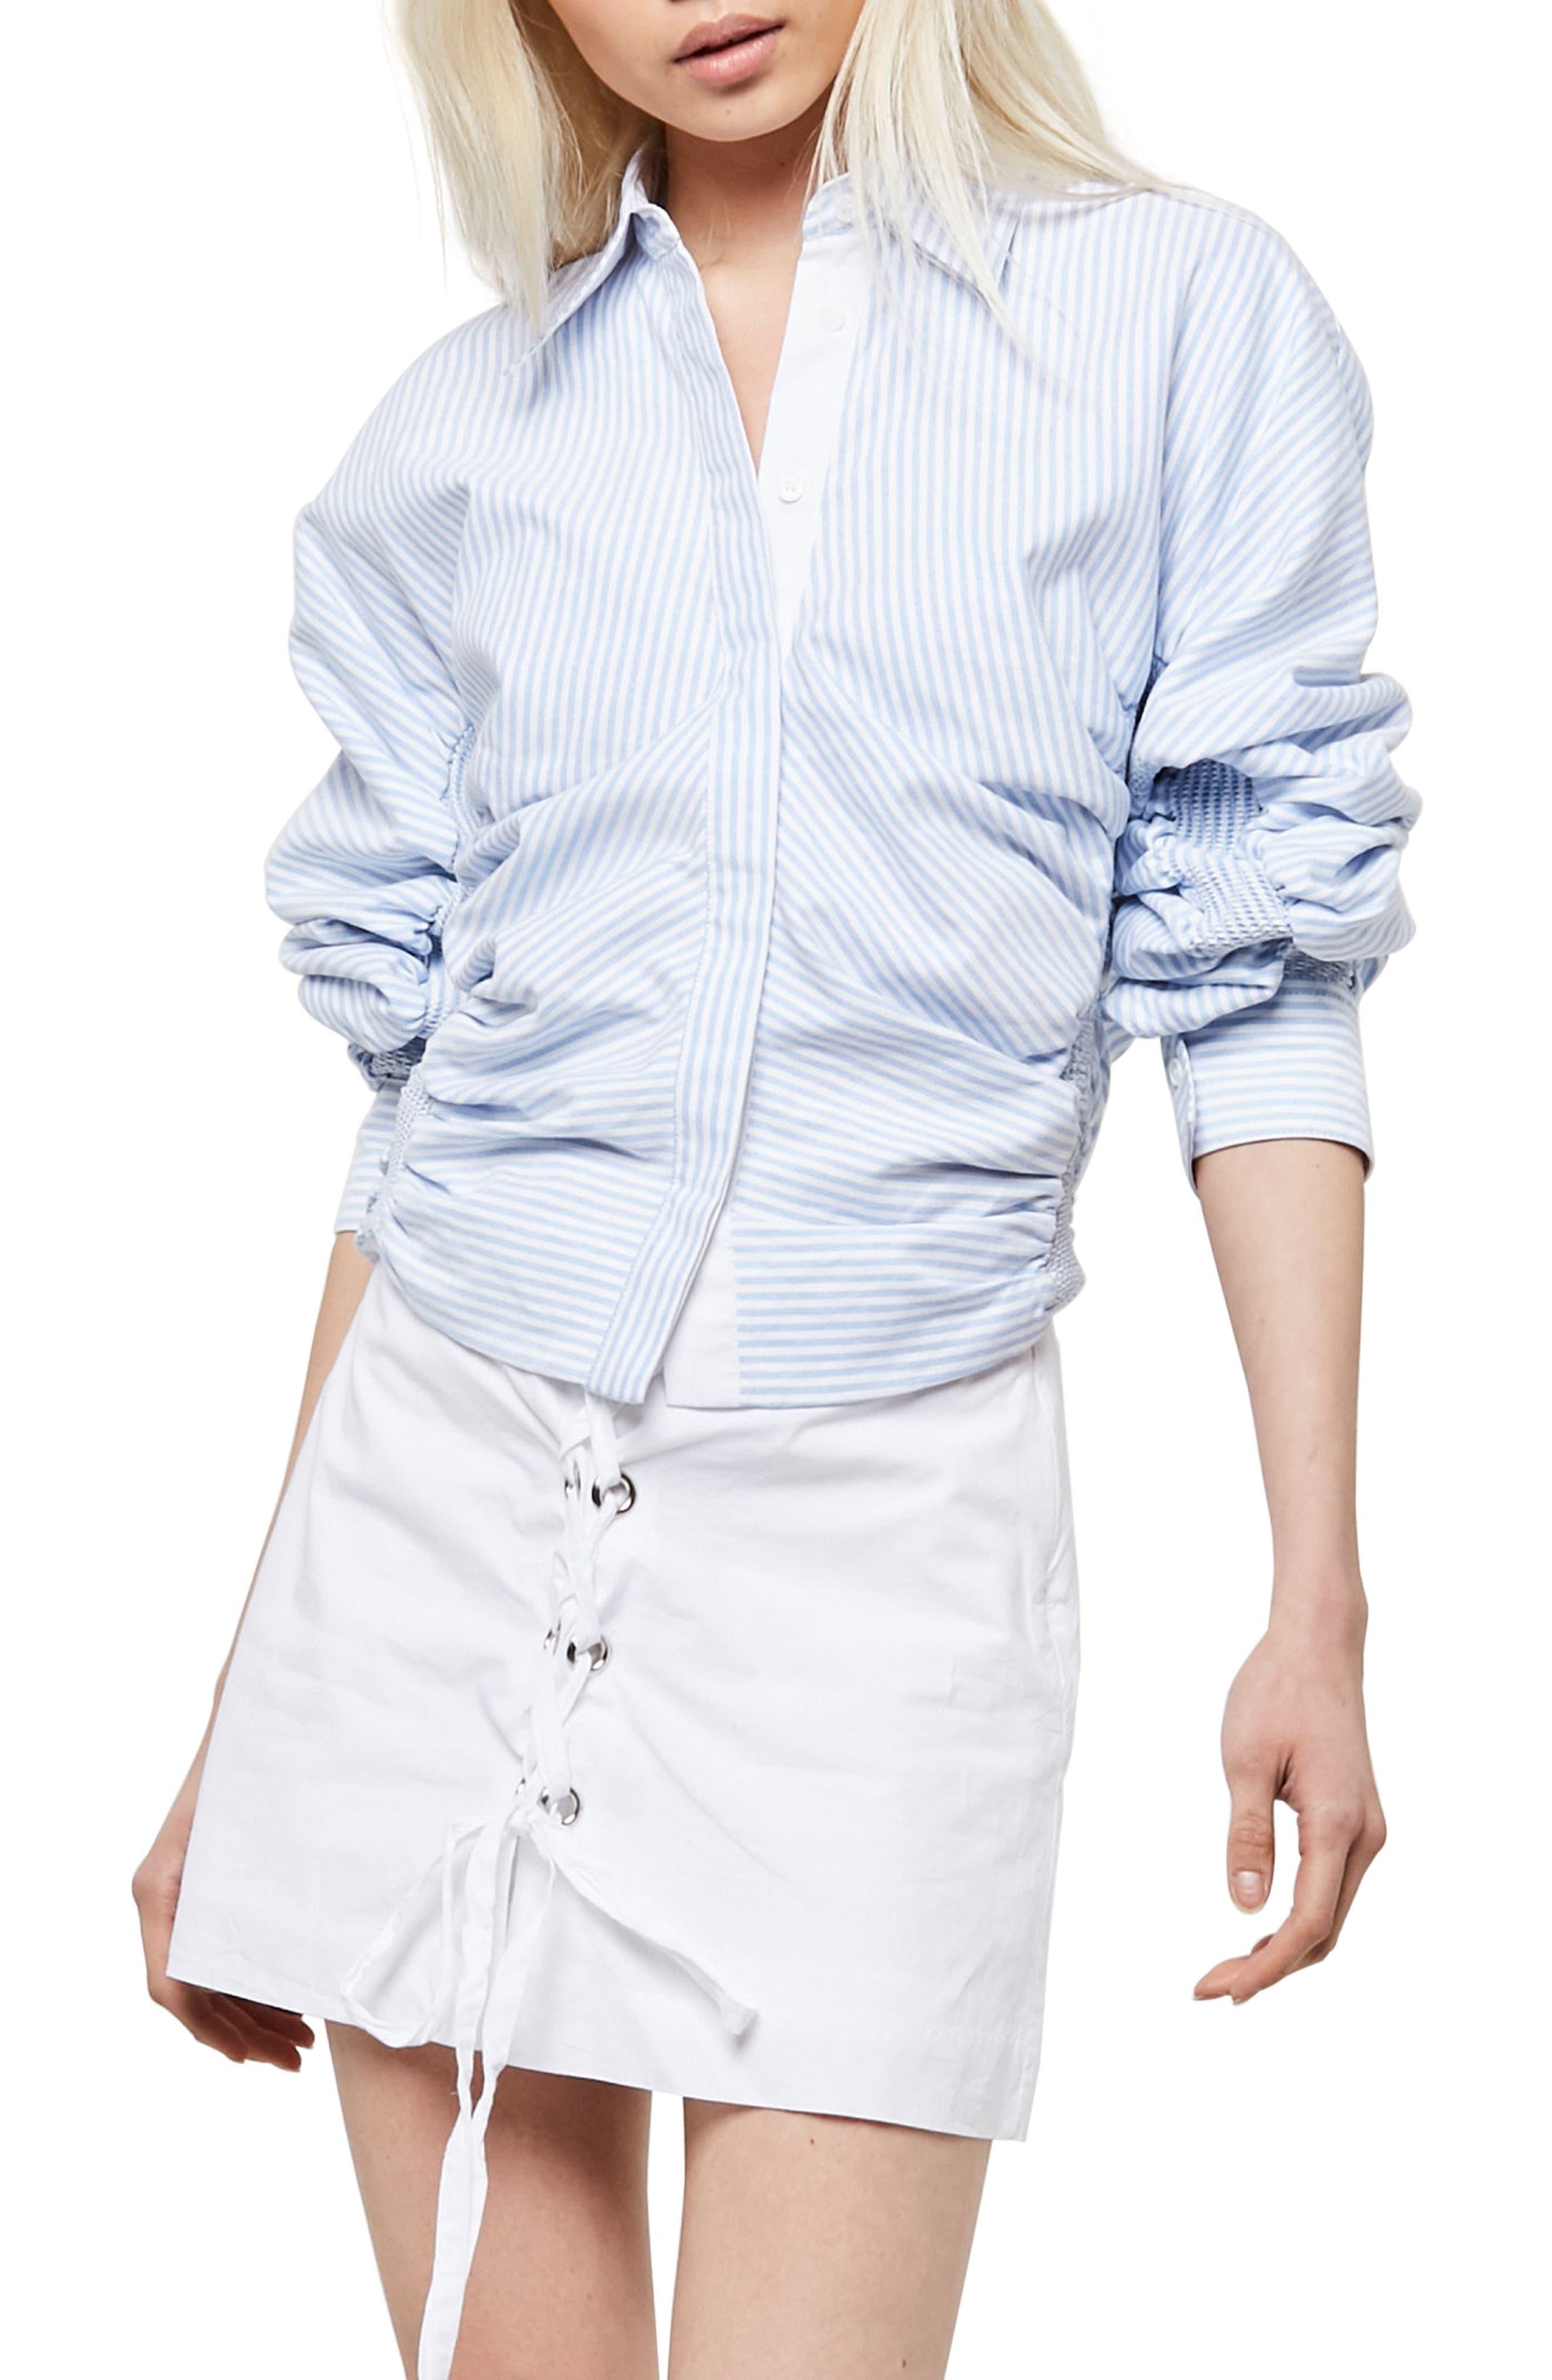 Alpha & Omega Smocked Sleeve Blouse,                         Main,                         color, Light Blue